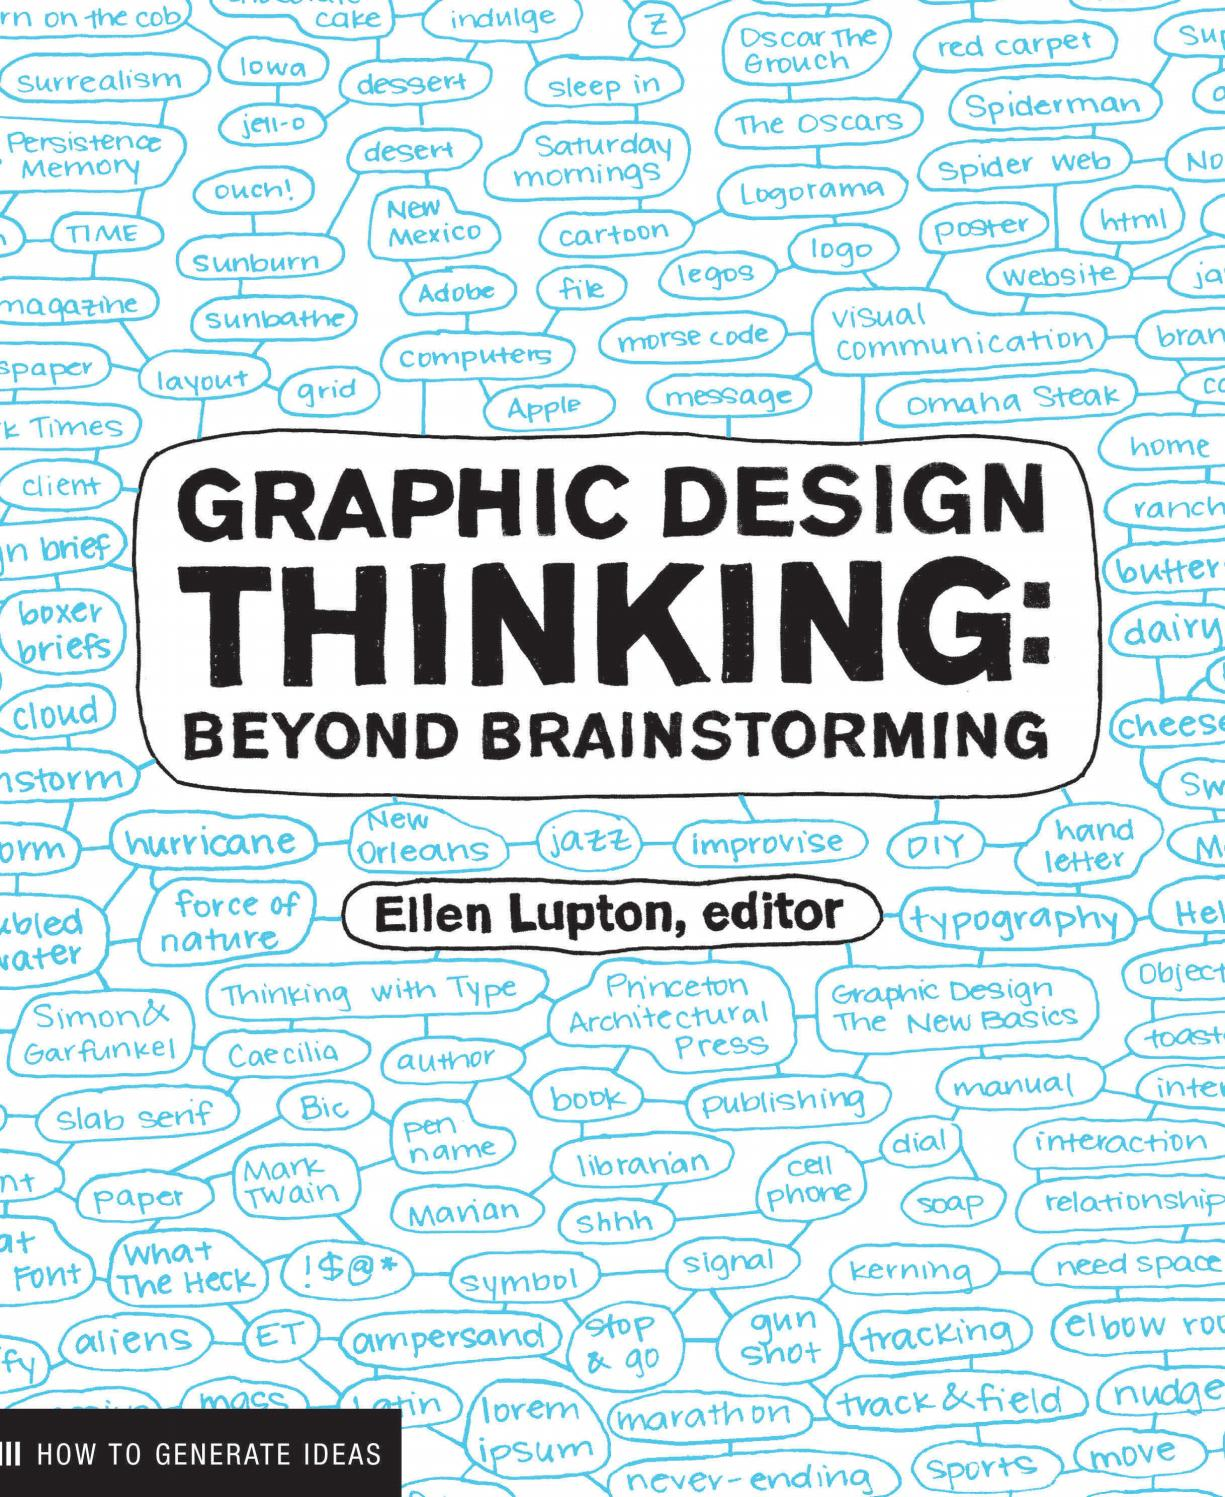 graphic design thinking beyond